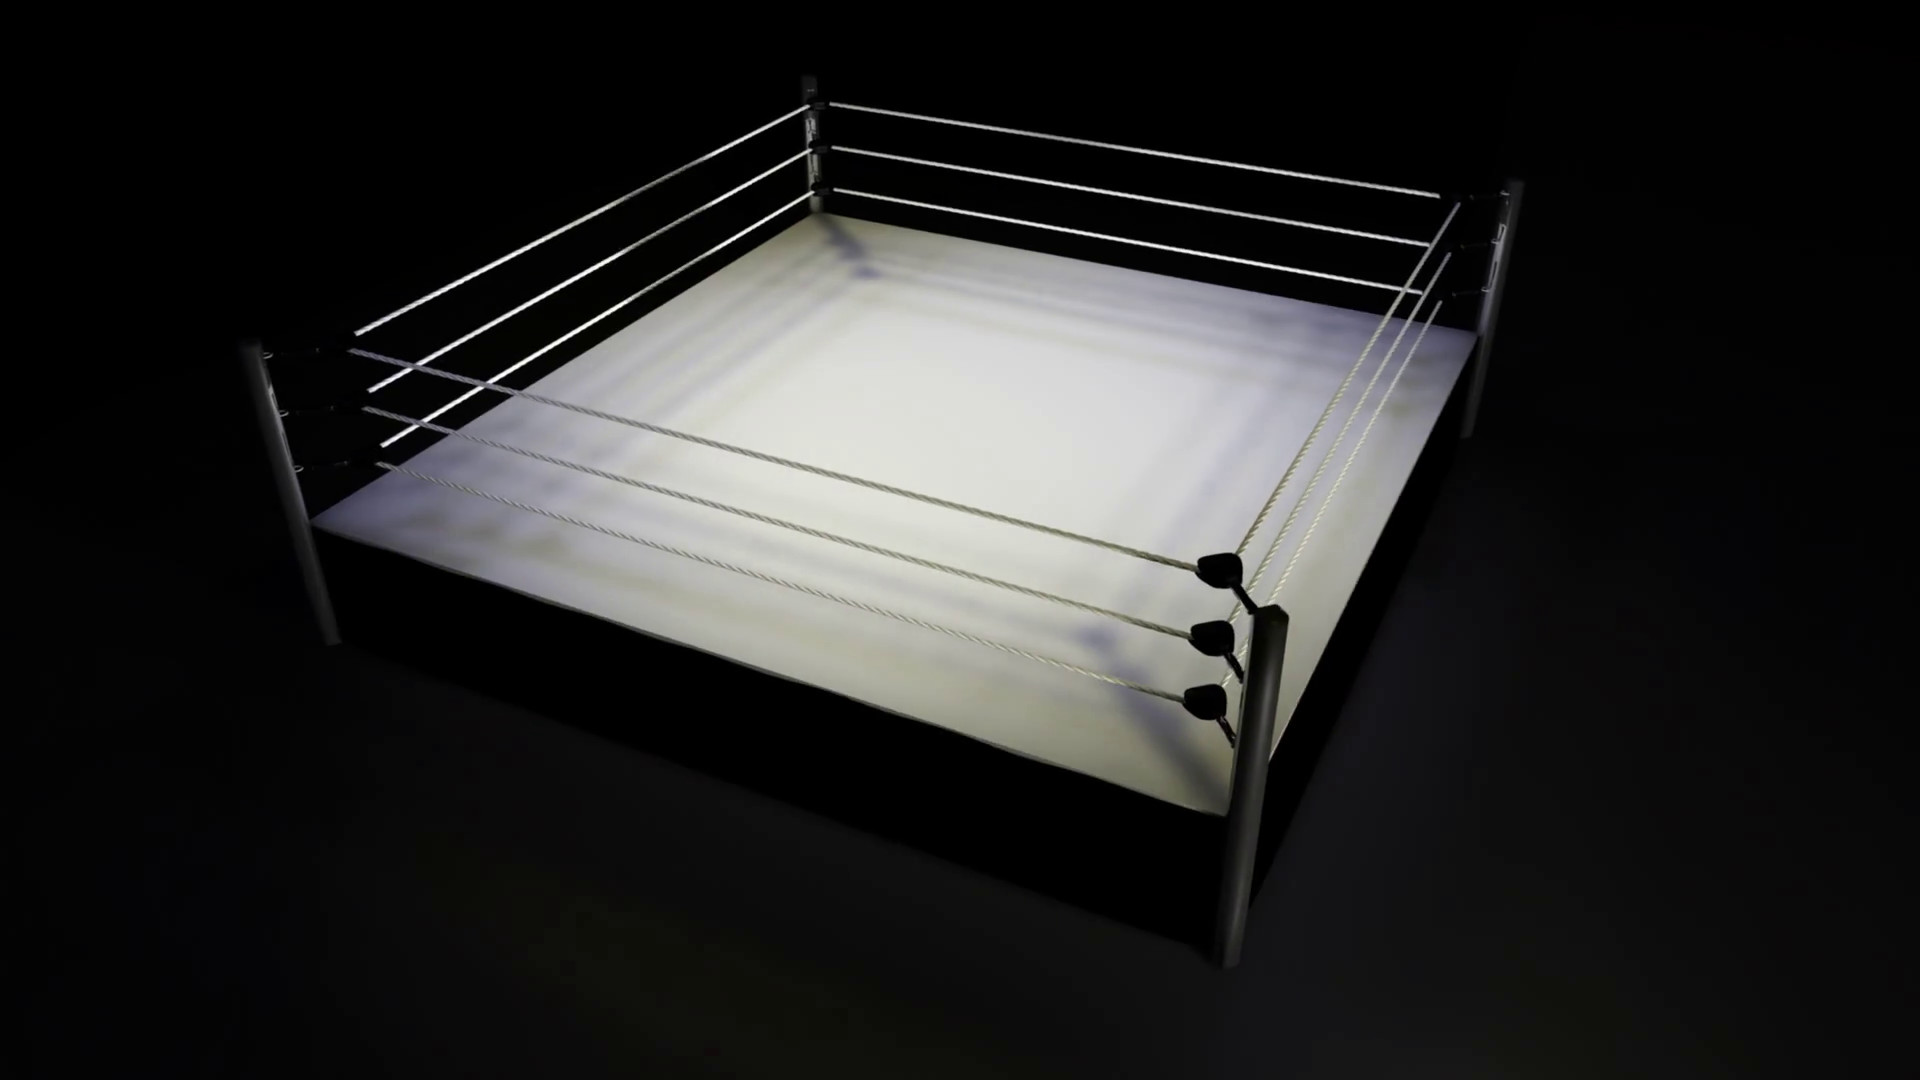 Rotating Boxing / Wrestling Ring on Black Background Motion Background –  VideoBlocks